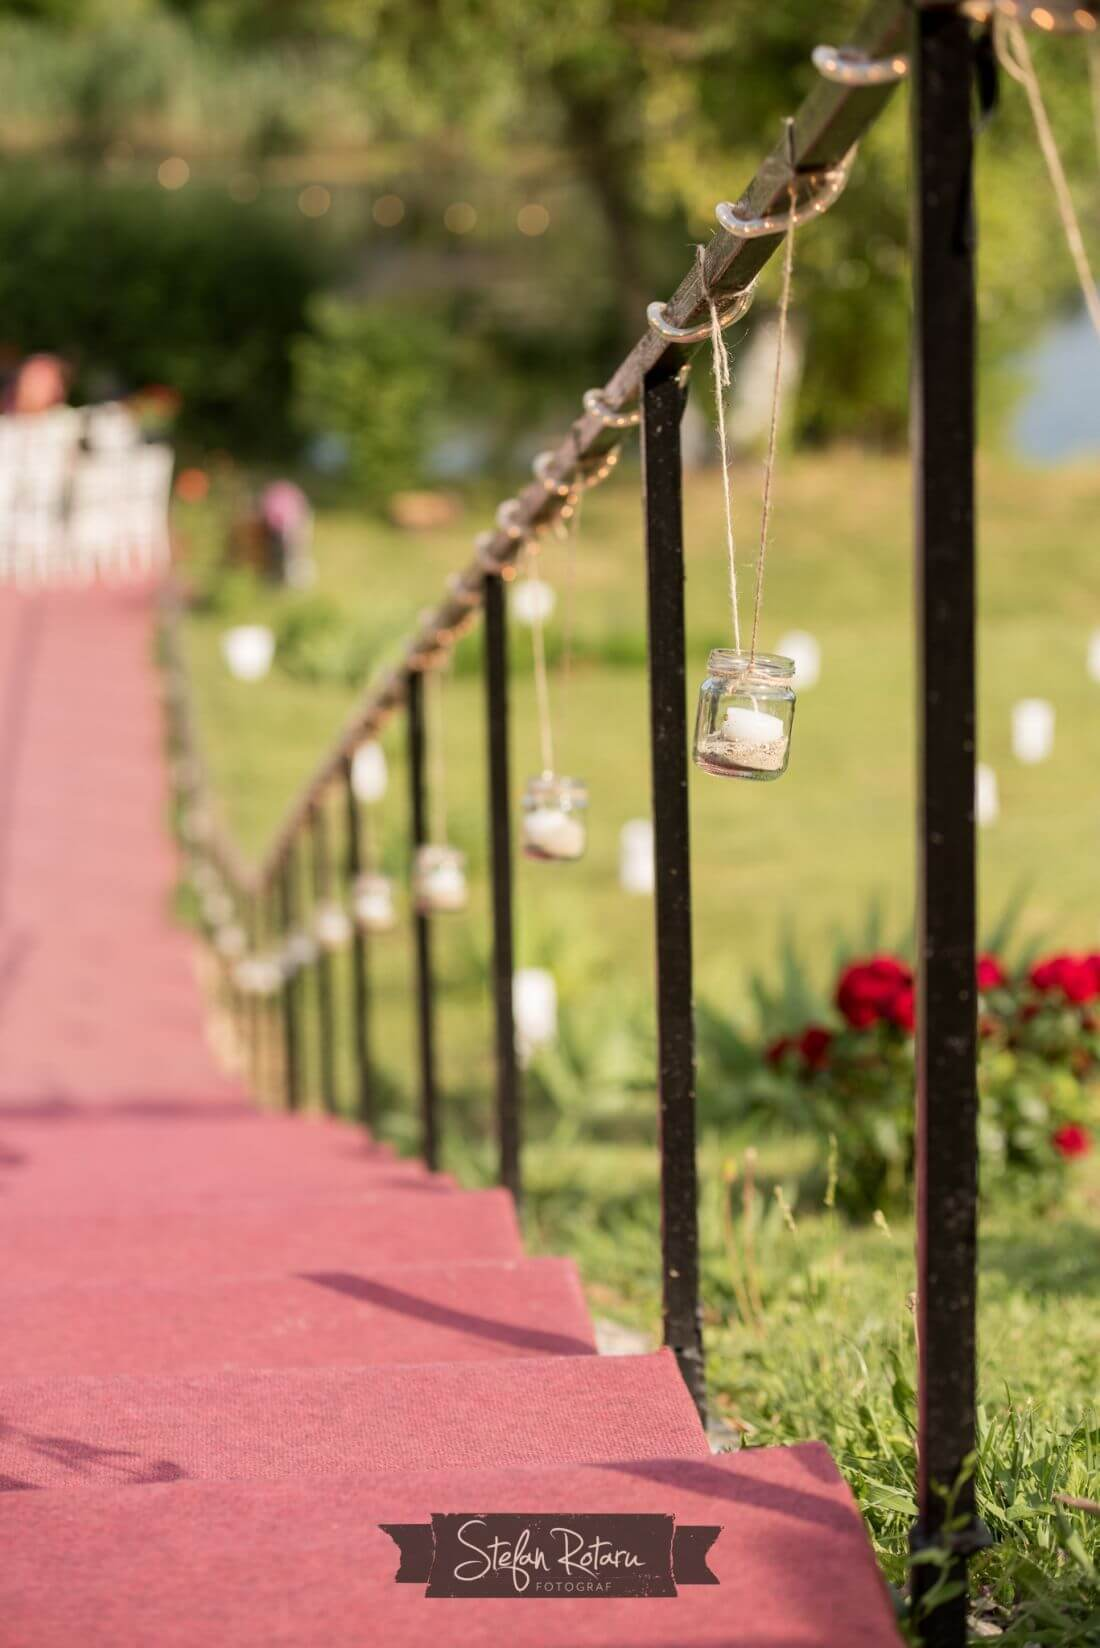 Petrecere ca-n Vama Veche - Alina si Cristi-IDO-Weddings-nuntiinaerliber (13)